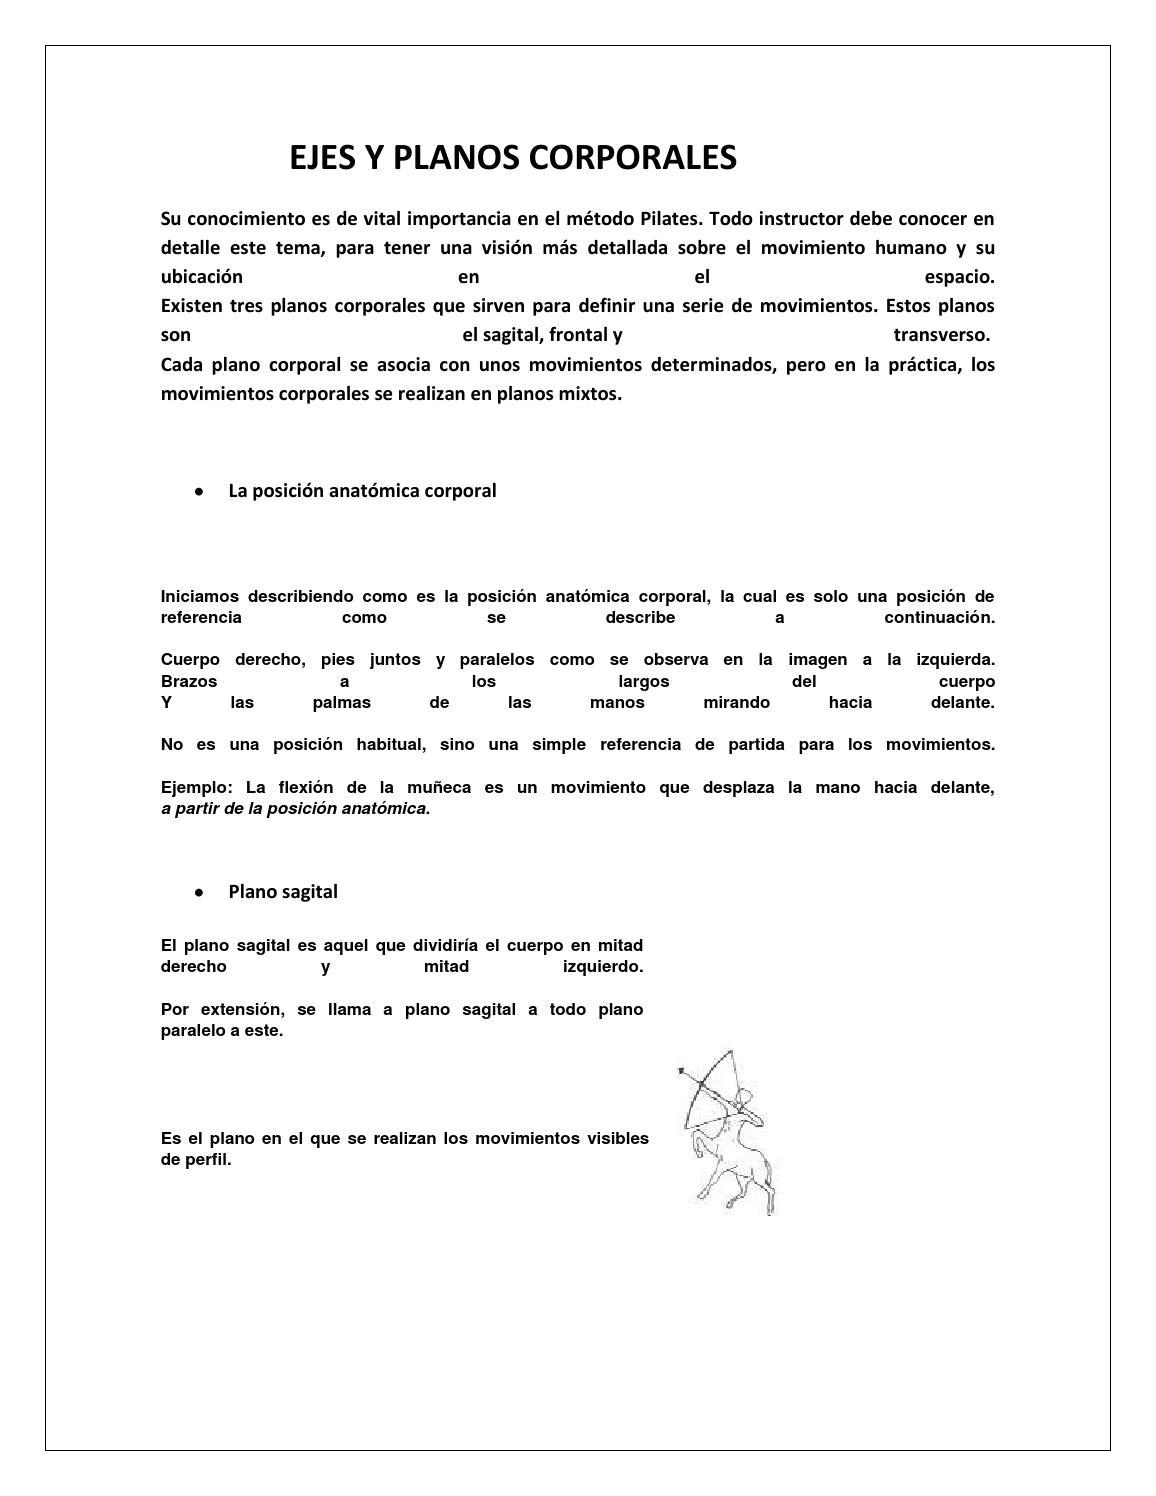 Ejes y planos corporales by yazuryflores - issuu